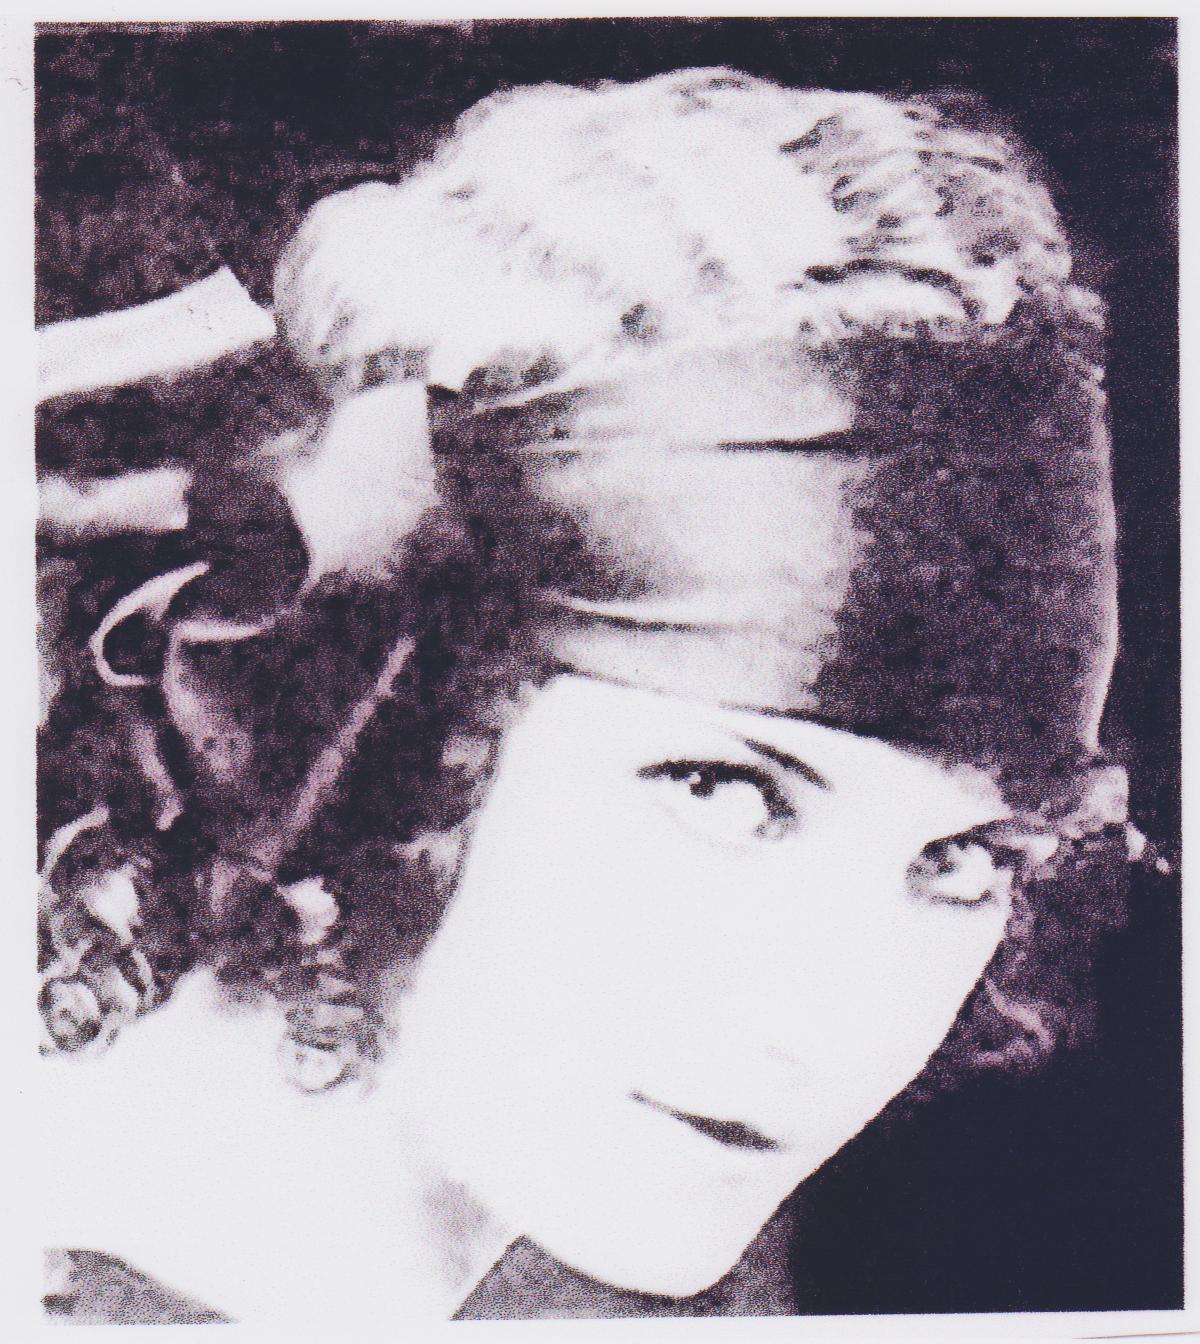 Ana Capri (b. 1977) XXX tube Justis Bolding,Alexandra Paul